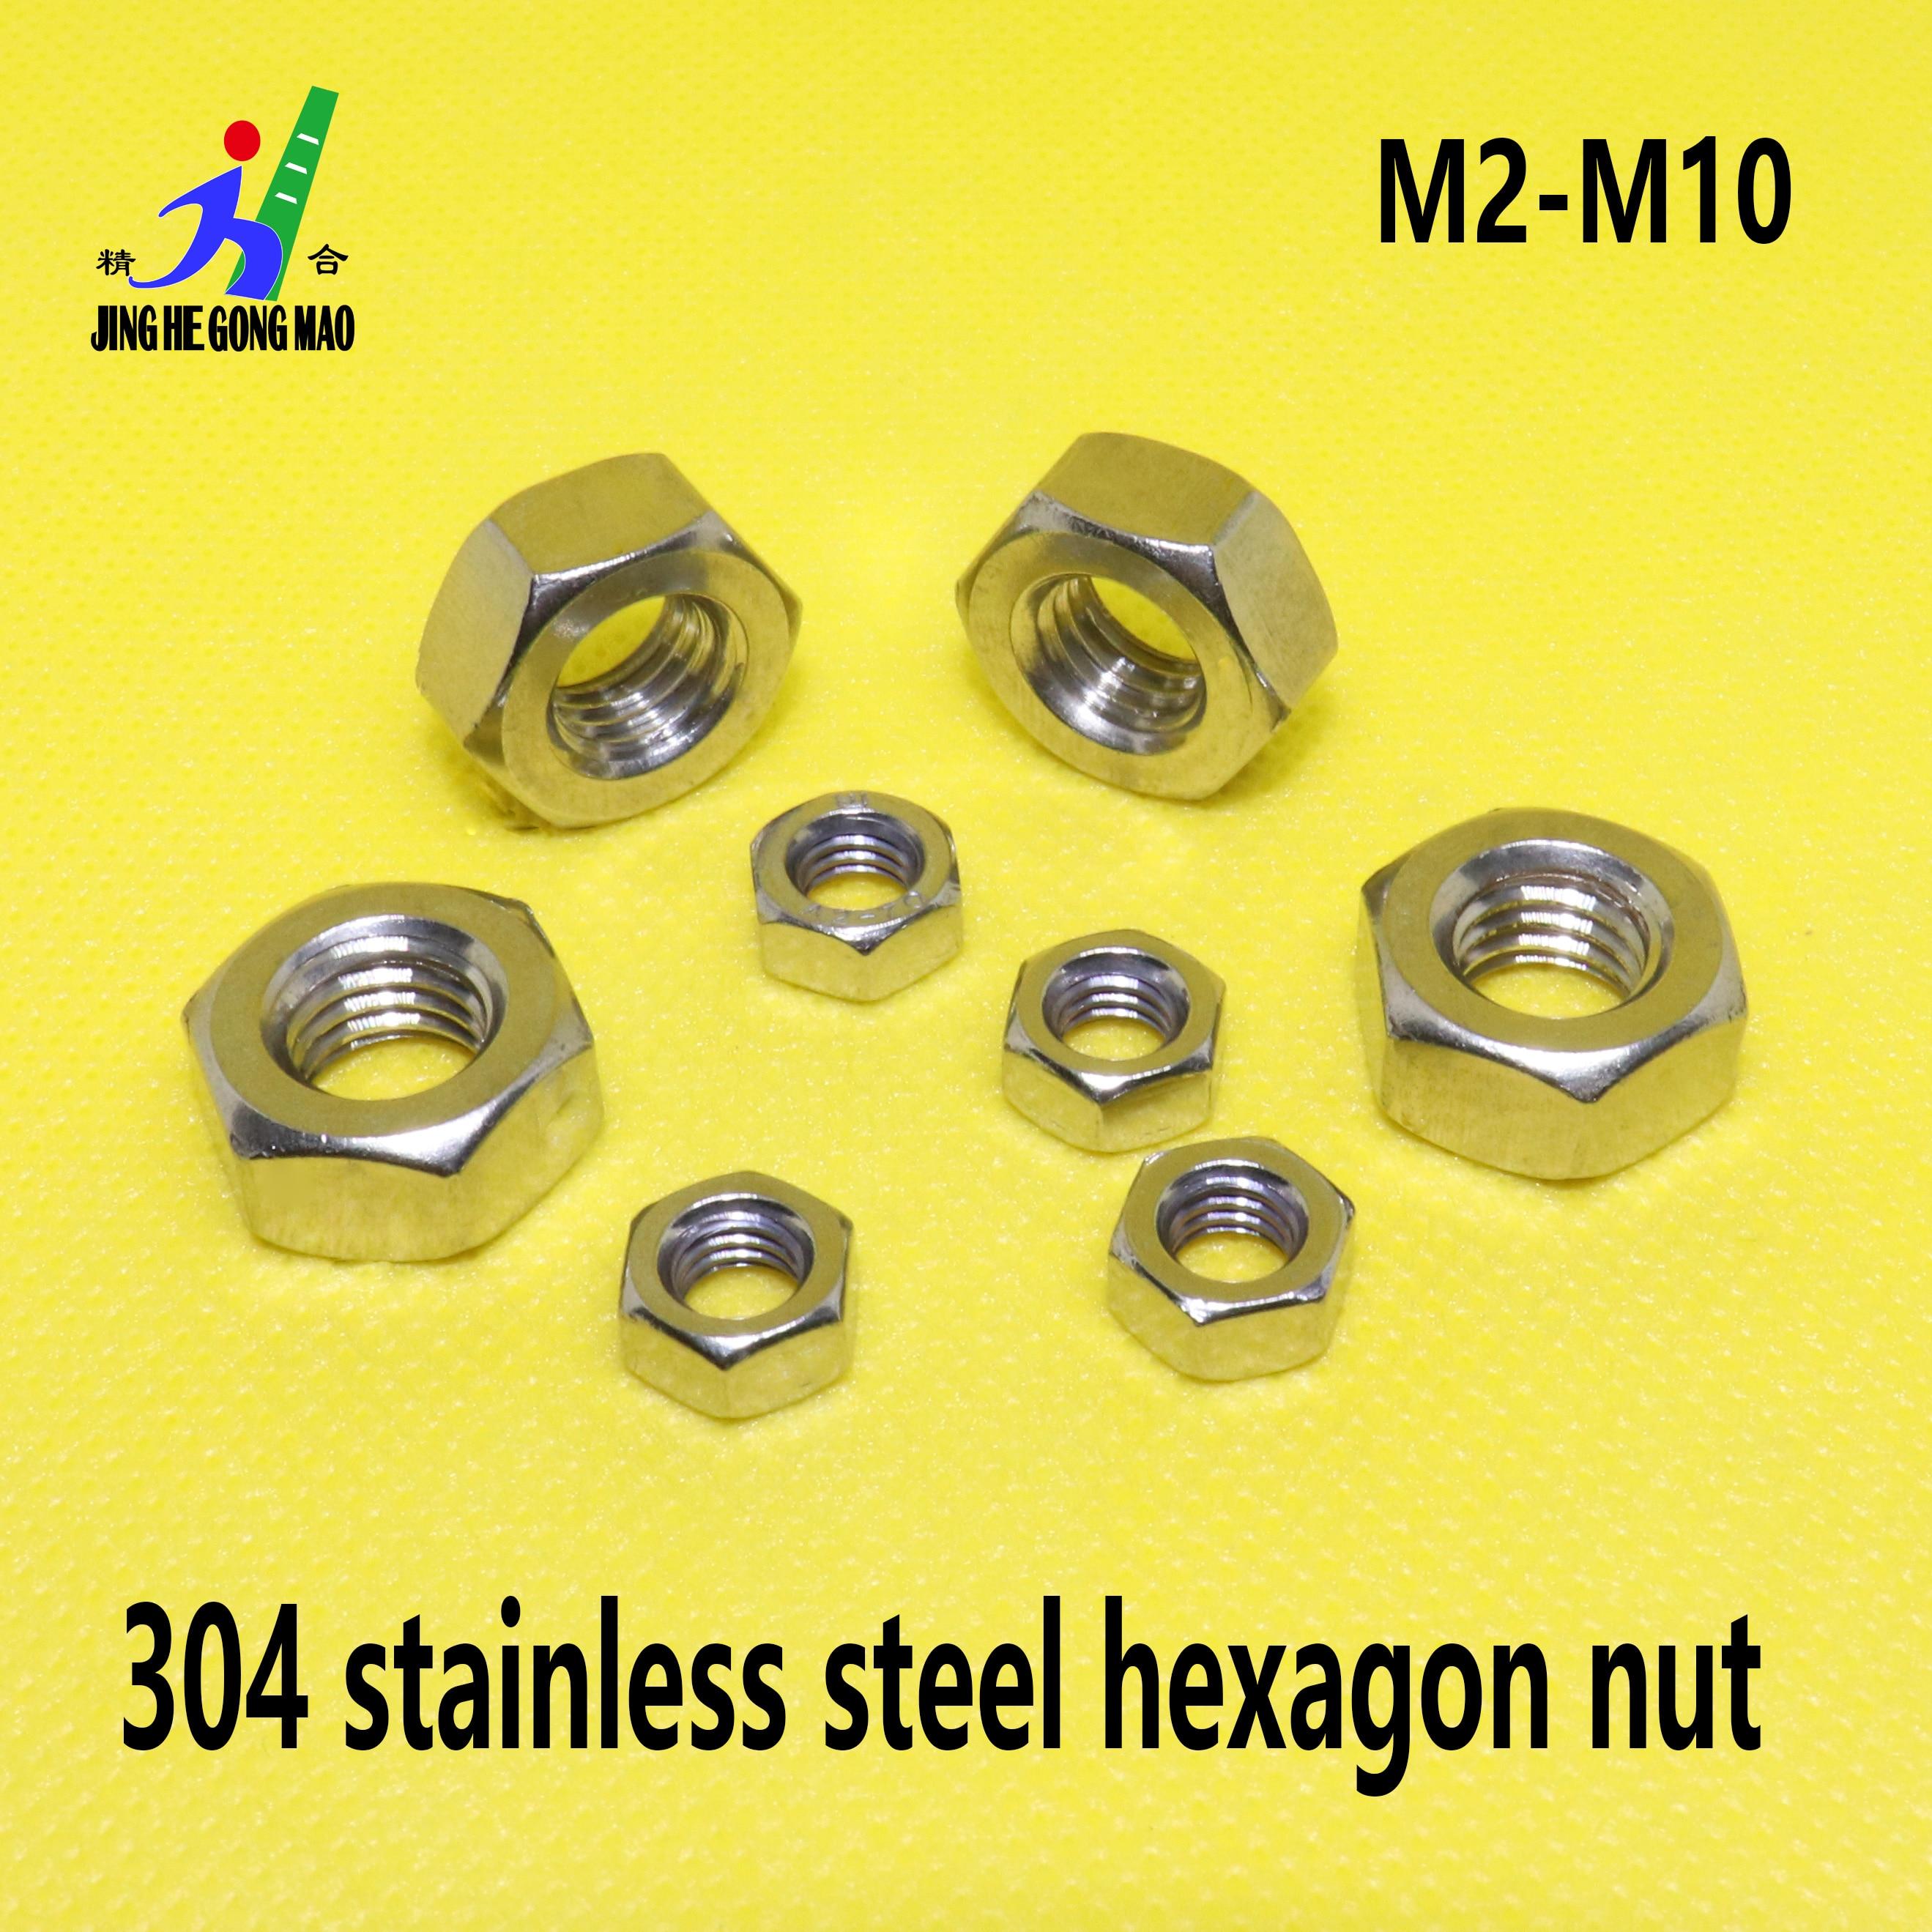 Écrou hexagonal en acier inoxydable A2 100 | 1/50/304 pièces pour M2 M2.5 M3 M4 M5 M6 M8 M10 M12 M16 M20 M24 boulon à vis|Noix|   - AliExpress